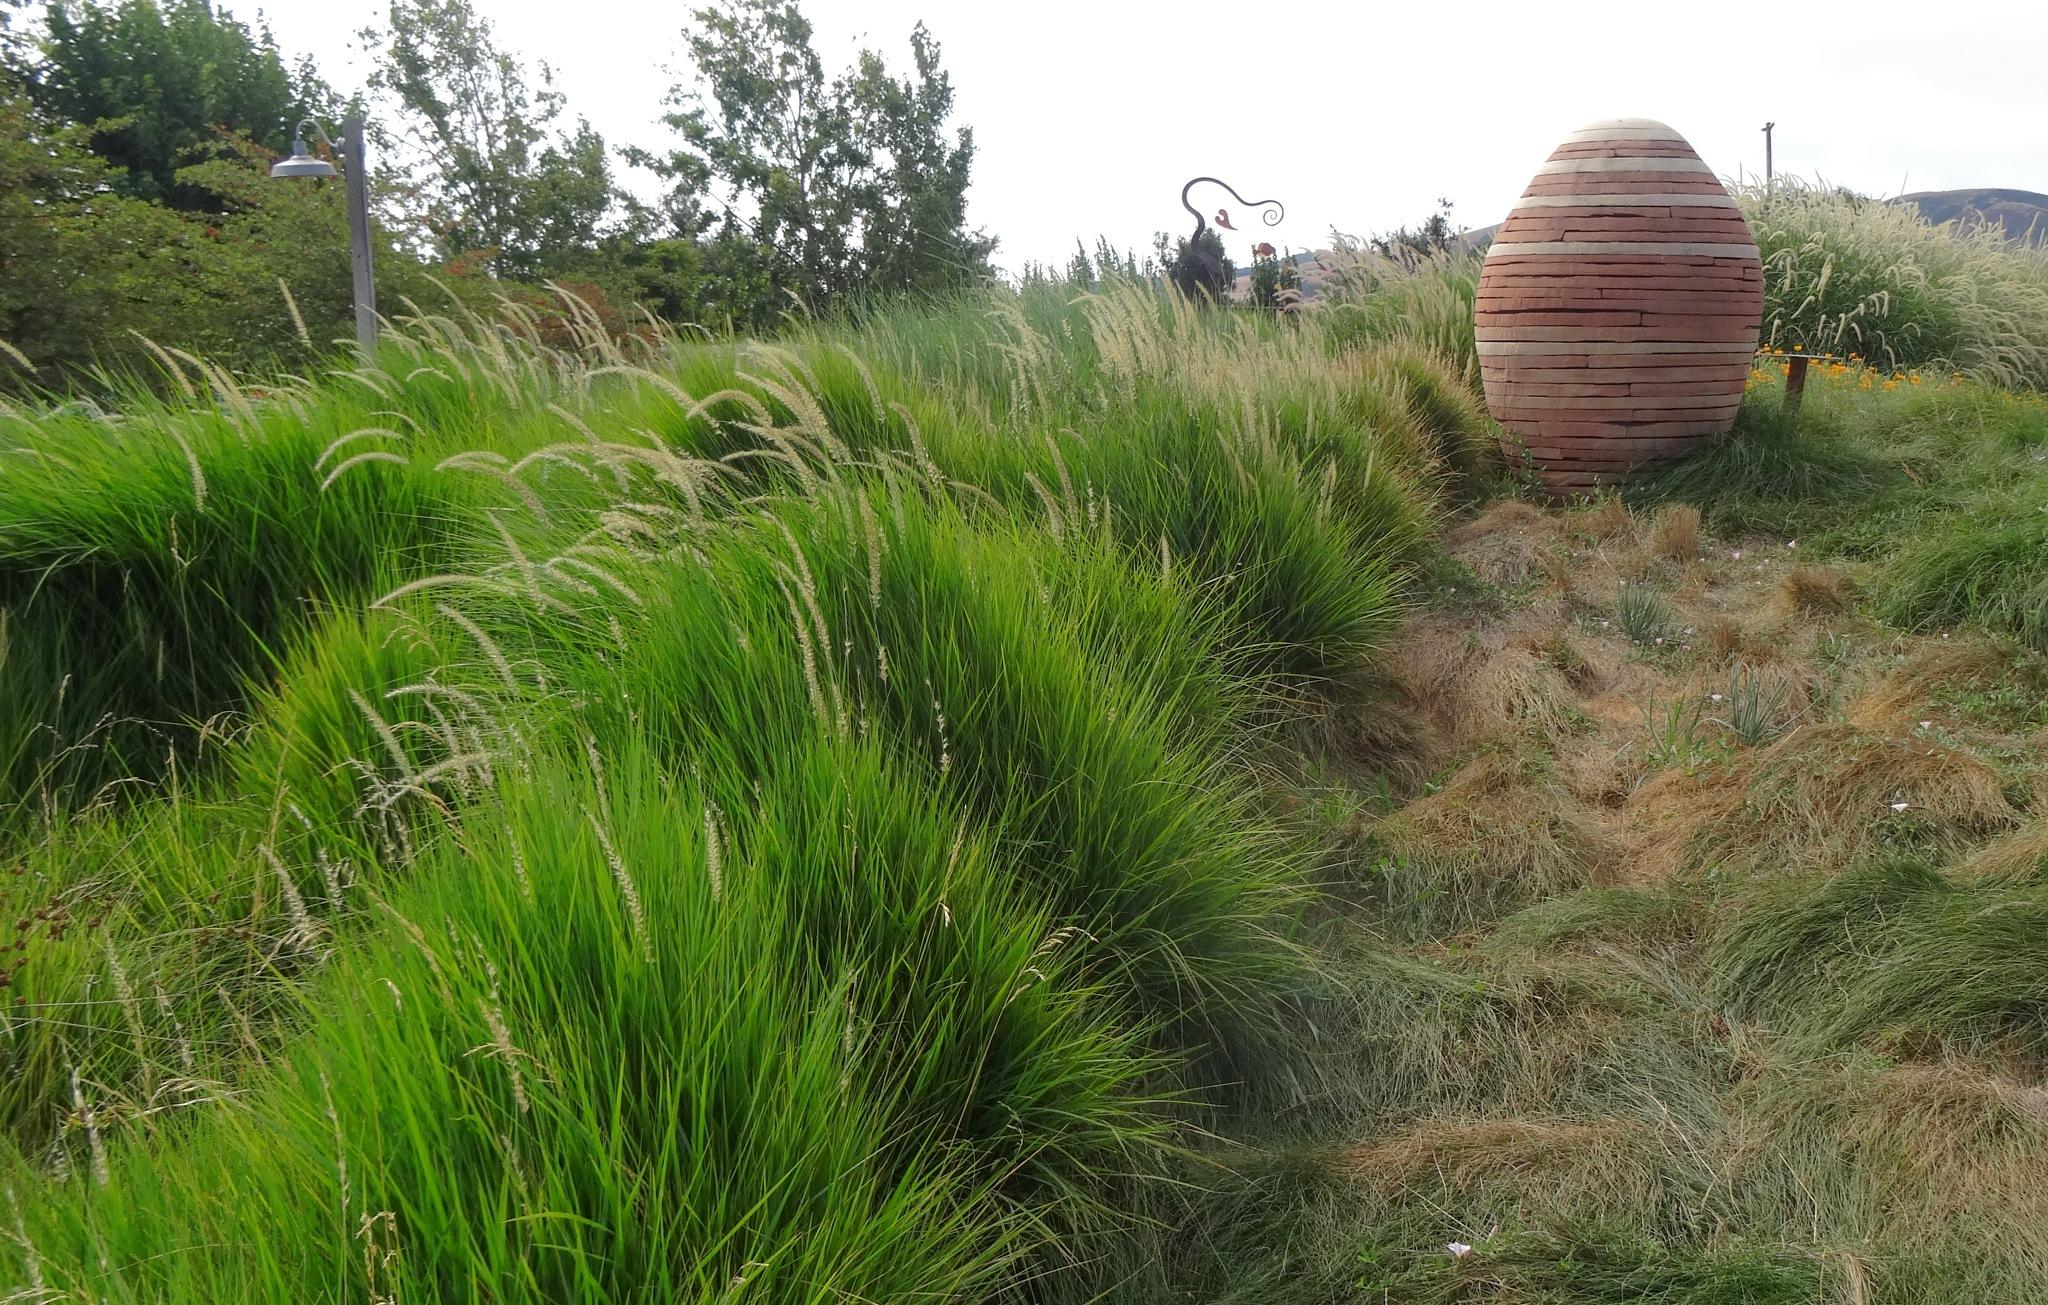 Wild grass garden / Stone Egg by Carolyn Chase